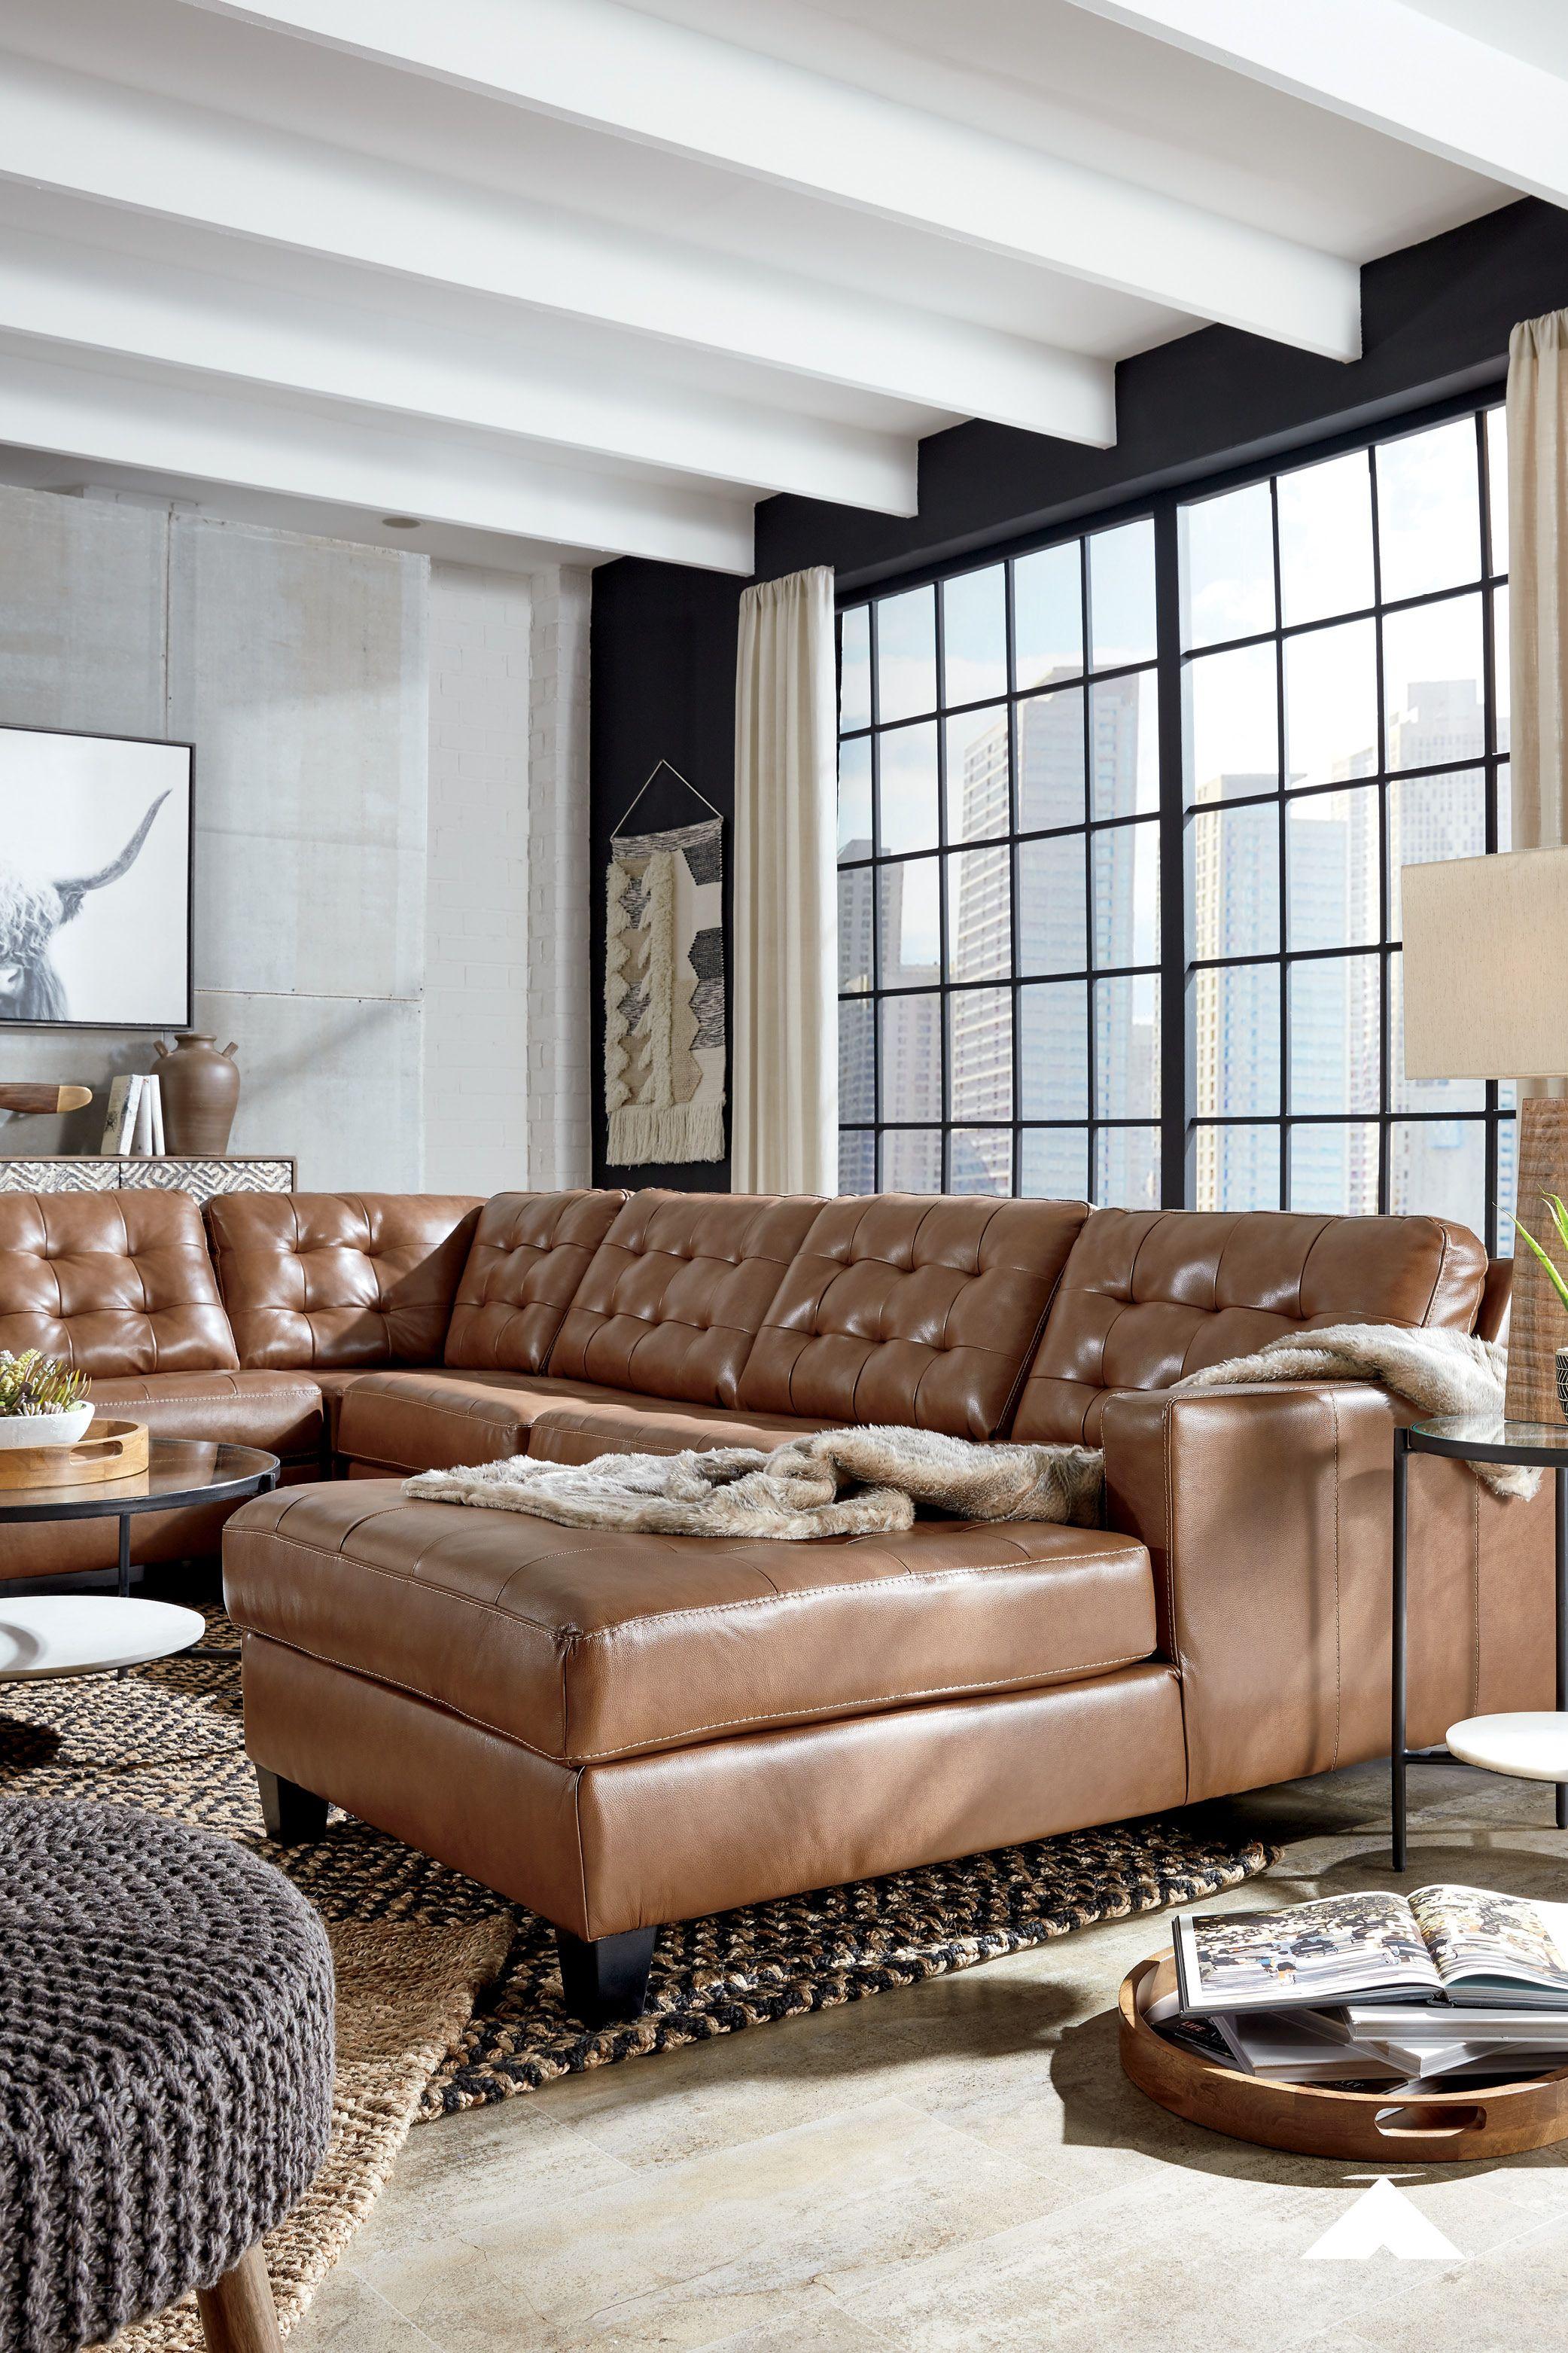 Baskove Auburn Sectional By Ashley Furniture Ashleyfurniture Sectional Leather Sectional Furniture